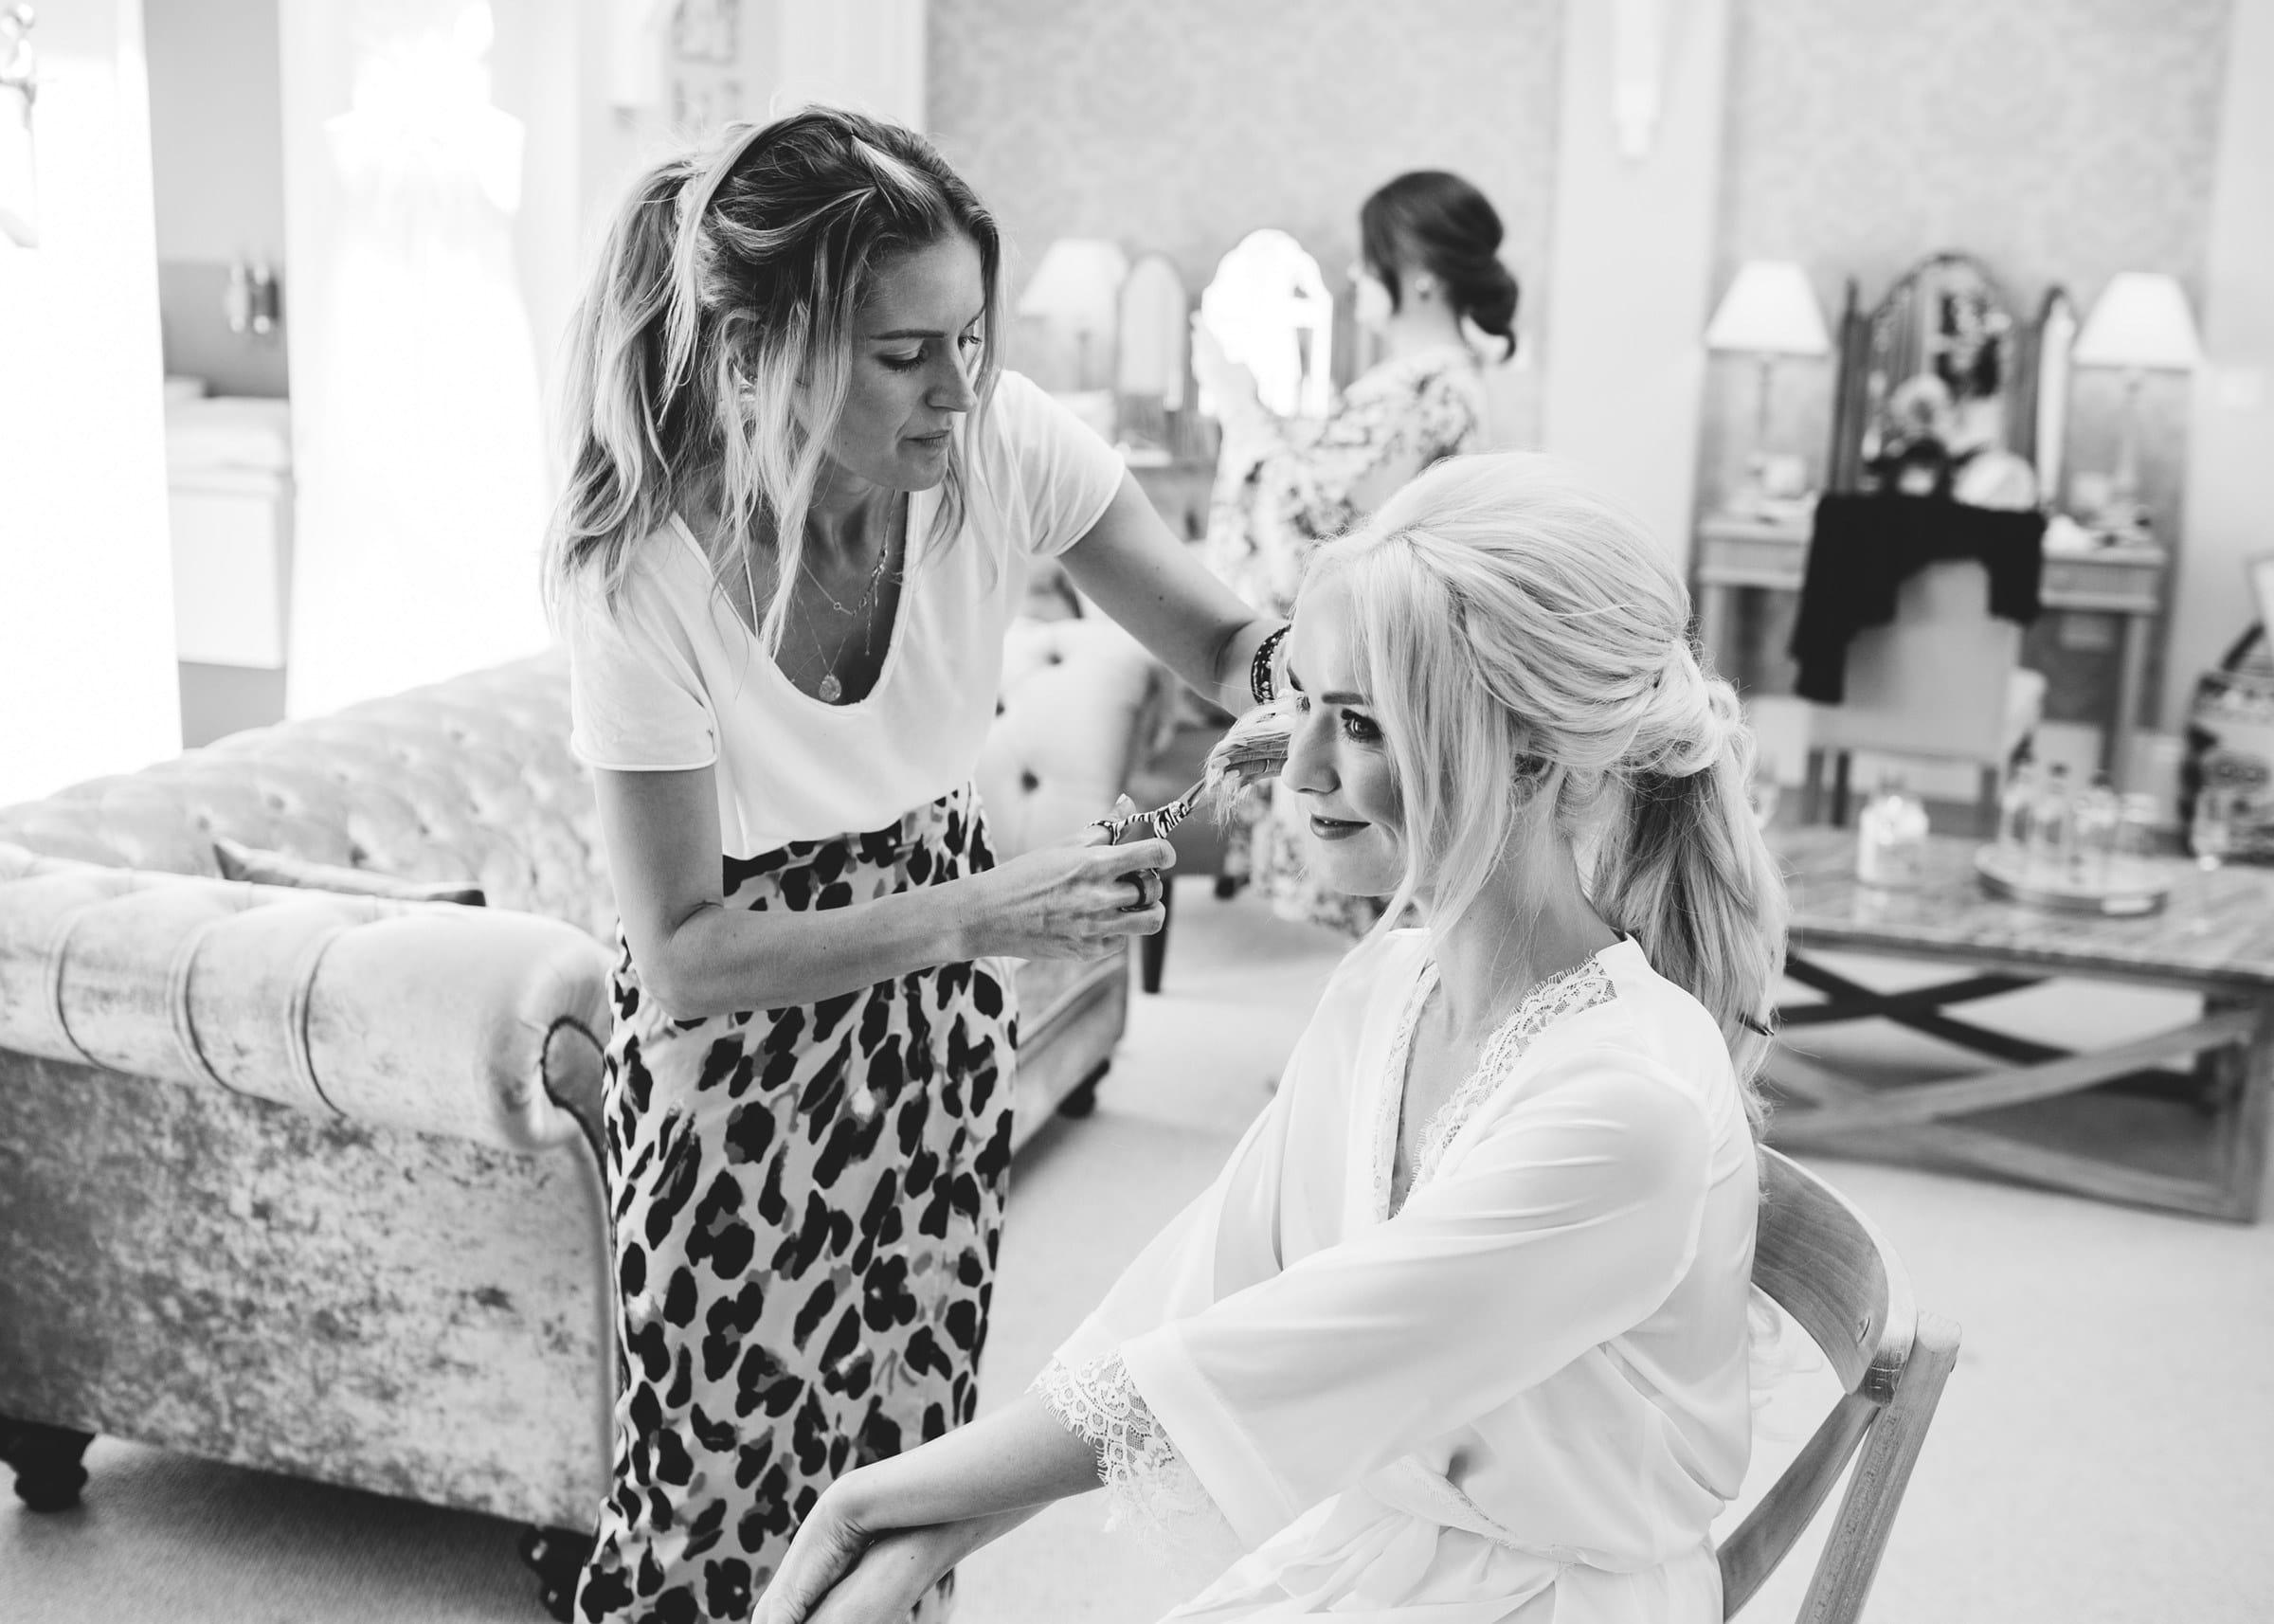 bride-getting-ready-on-her-wedding-morning-